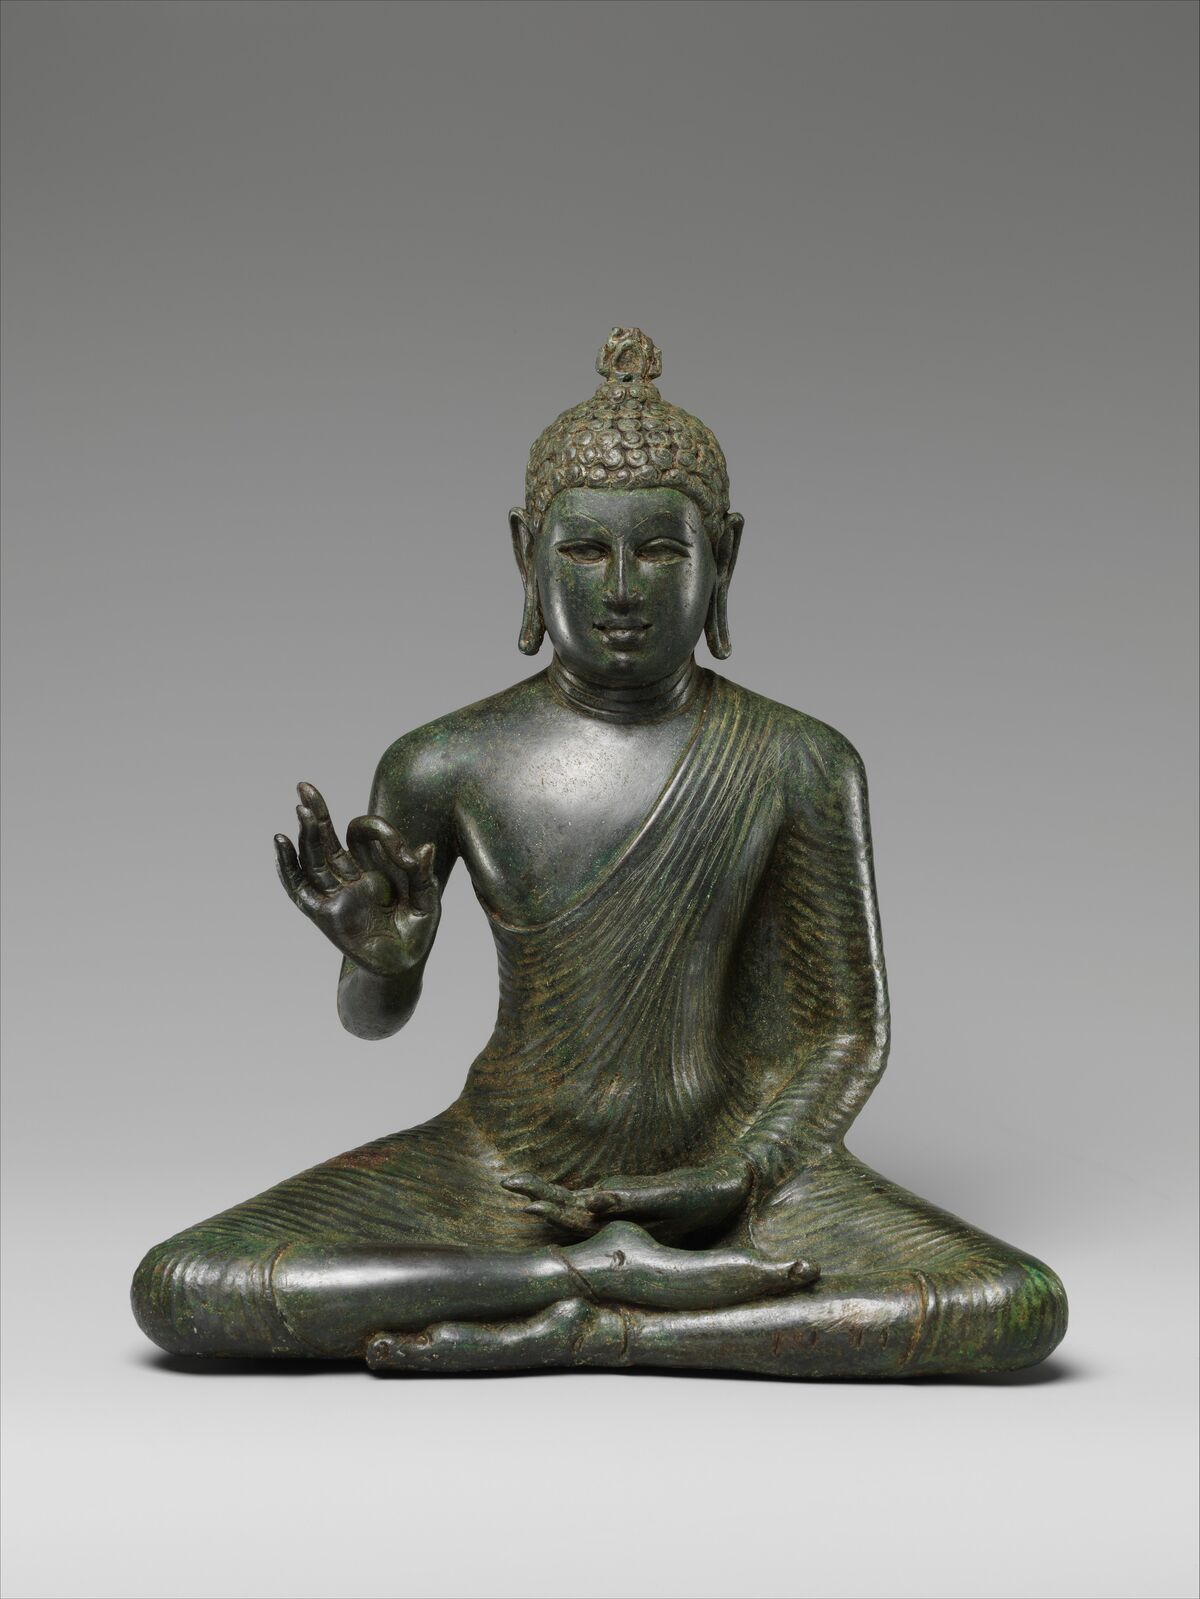 Buddha Expounding the Dharma, late 8th century Sri Lanka (Anuradhapura). Courtesy of The Metropolitan Museum of Art.